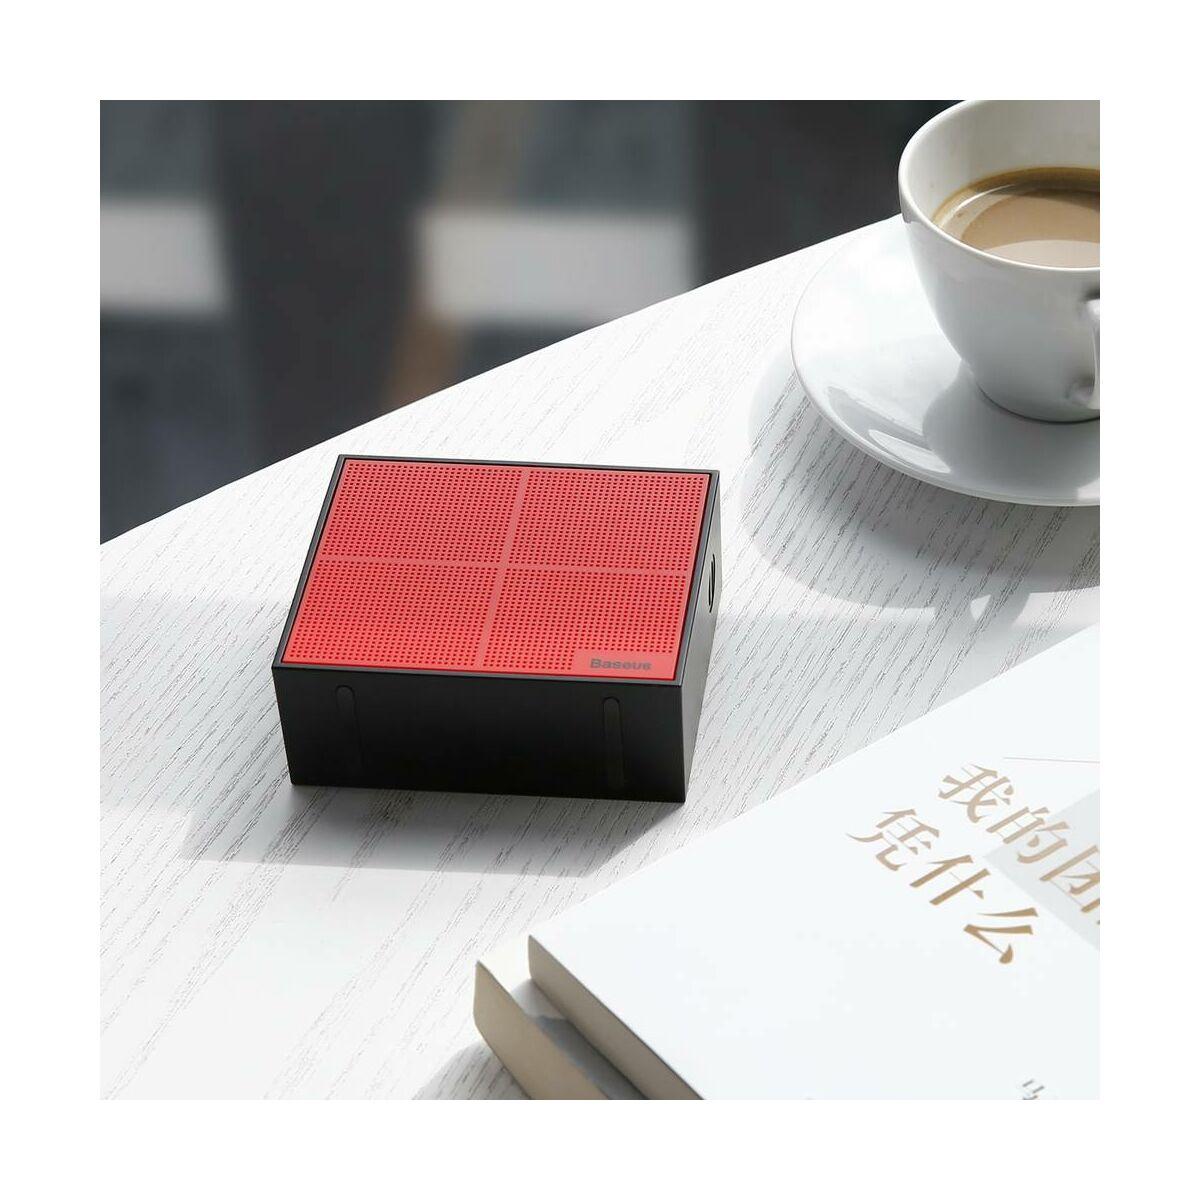 Baseus Hordozható hangszóró, Bluetooth Encok E05, Music-cube, piros/fekete (NGE05-91)